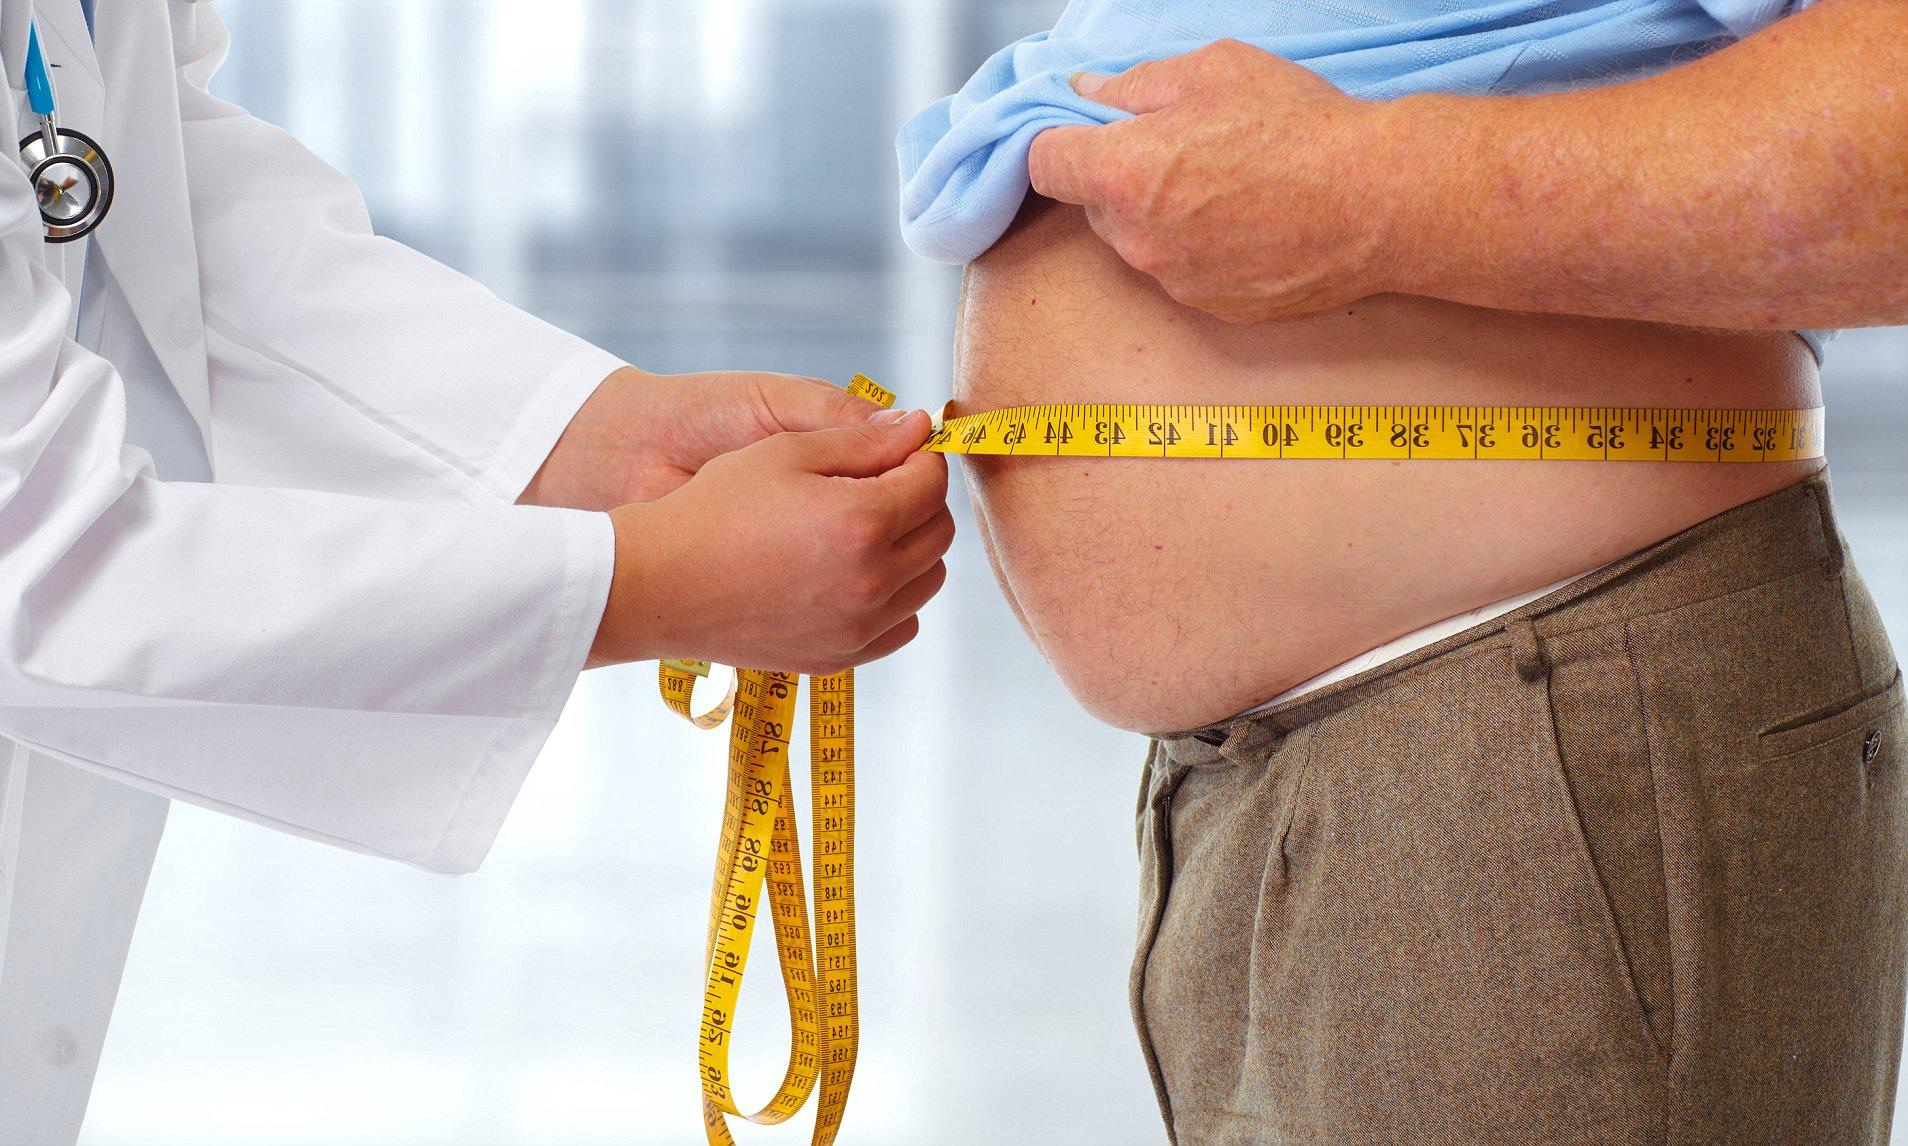 weight-loss-surgery Failed Weight Loss Surgery?